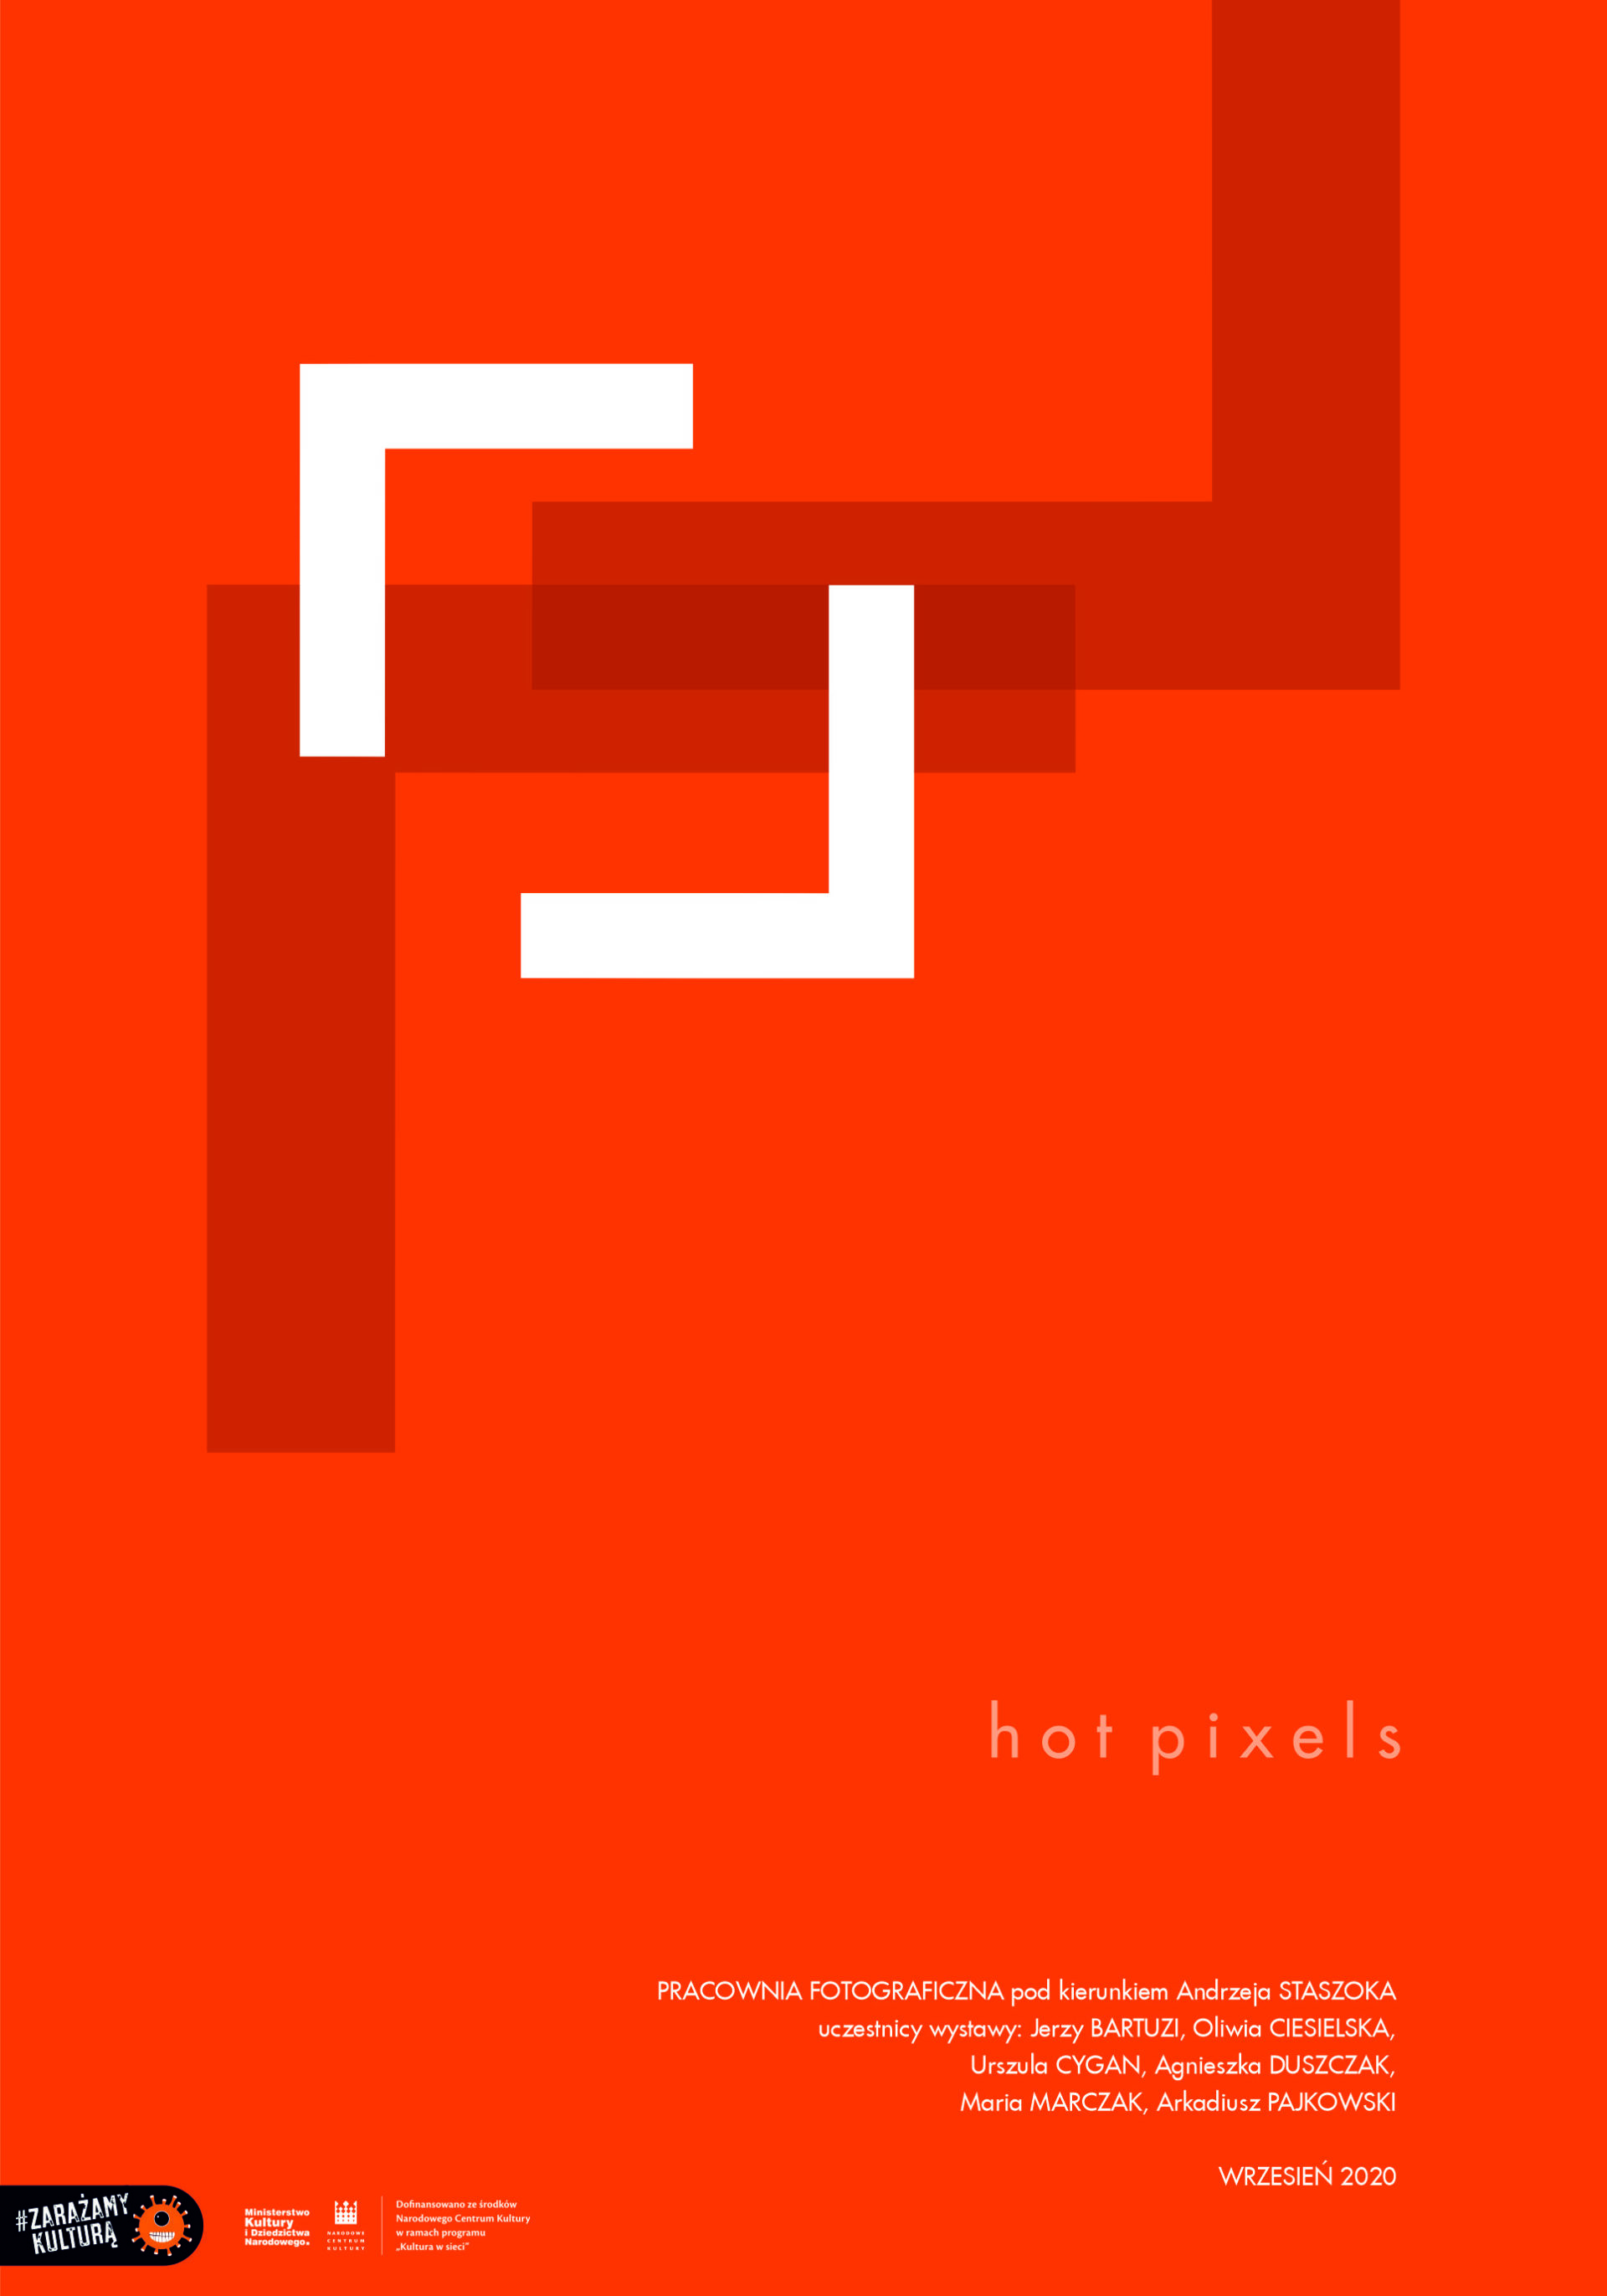 Pracownia Fotograficzna OCK | Hot pixels | wernisaż online